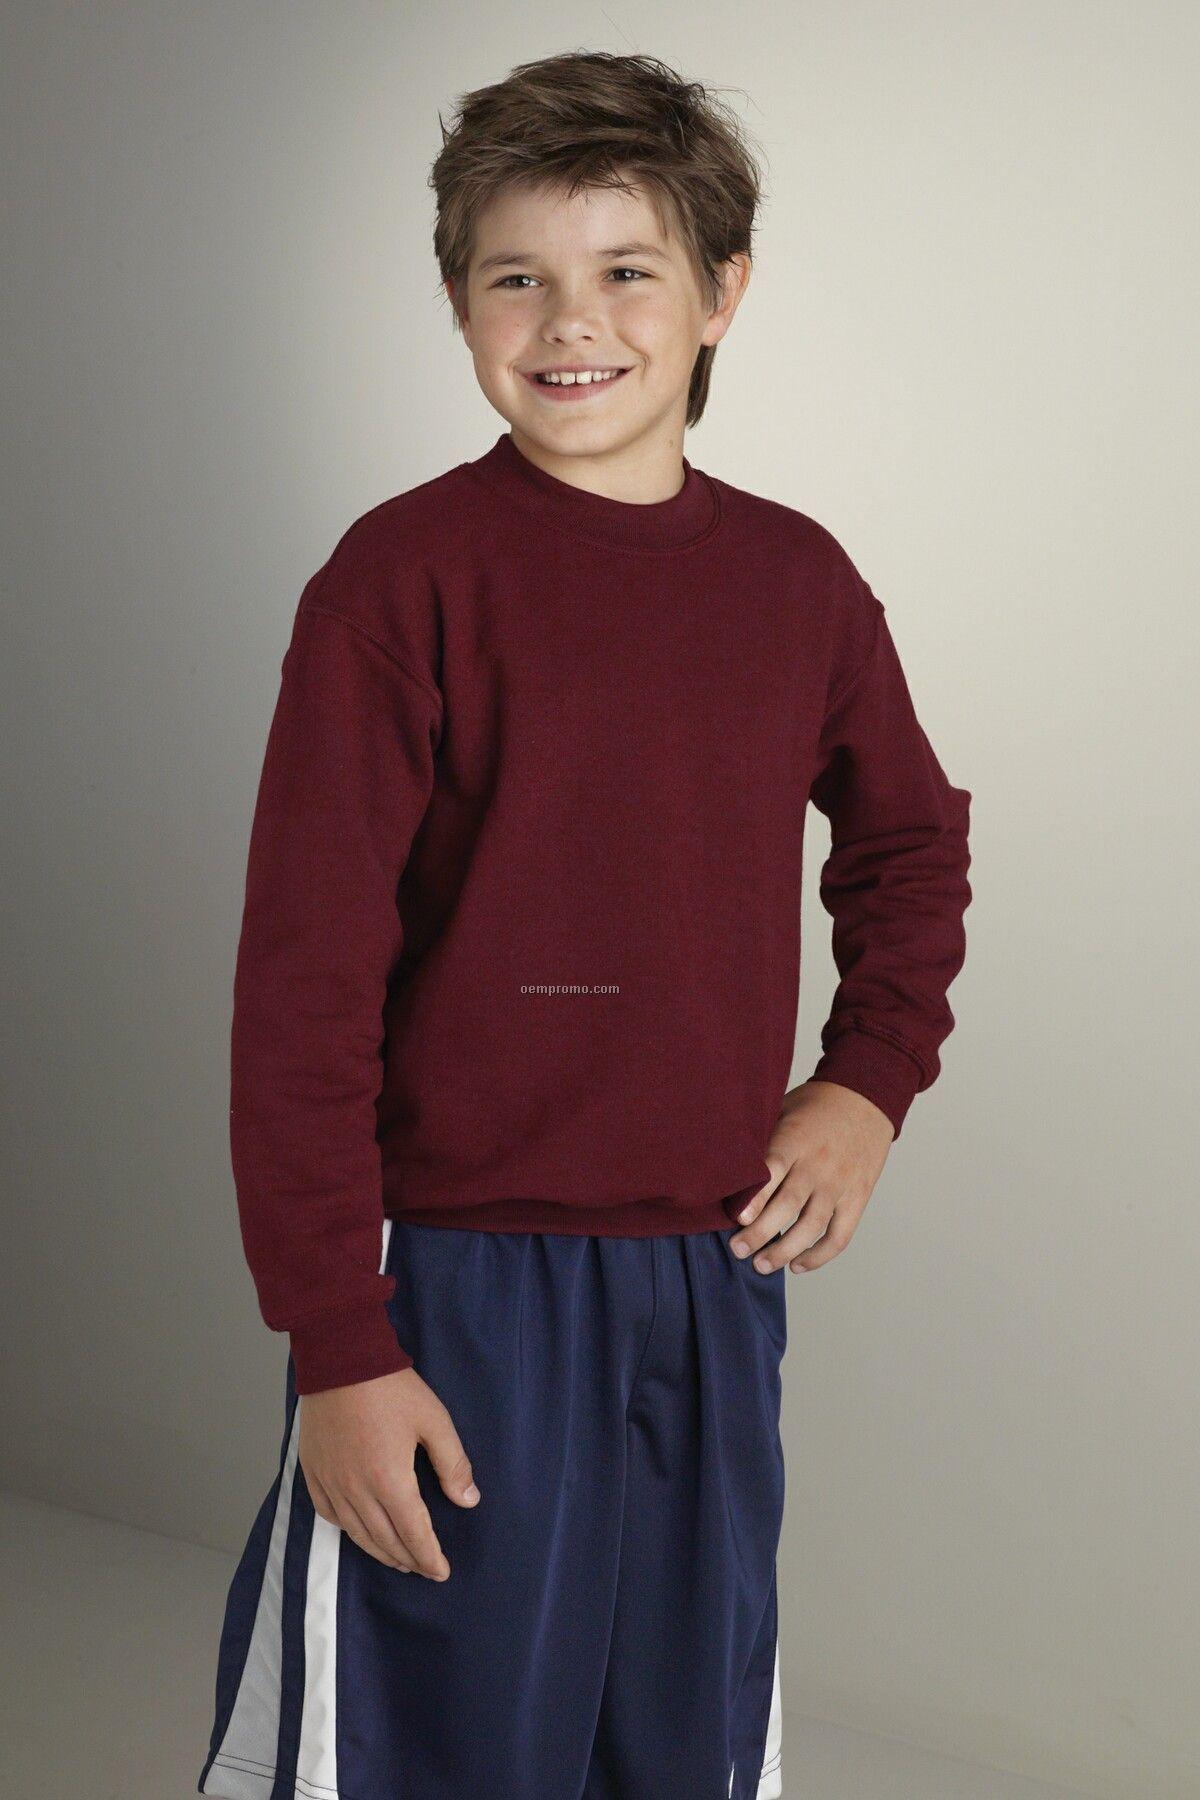 Youth Gildan Heavy Blend Crewneck Sweatshirt - Heather